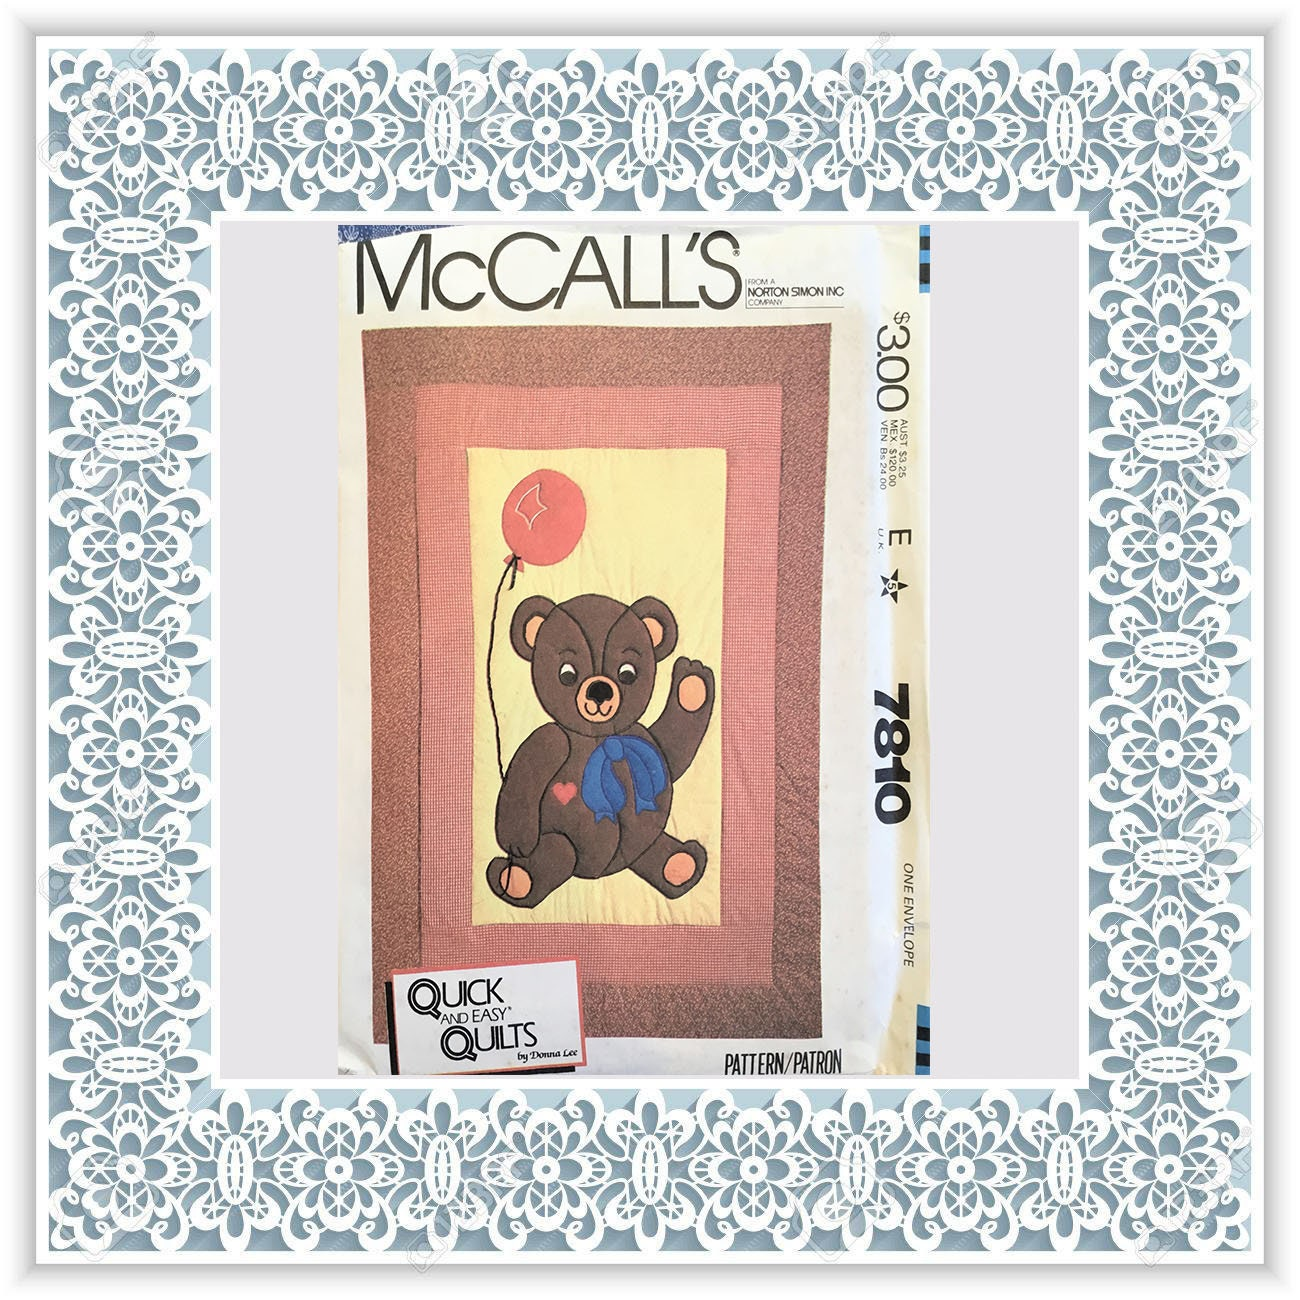 Mccalls 7810 1981 Teddy Bear Quilt Vintage Uncut Sewing Pattern